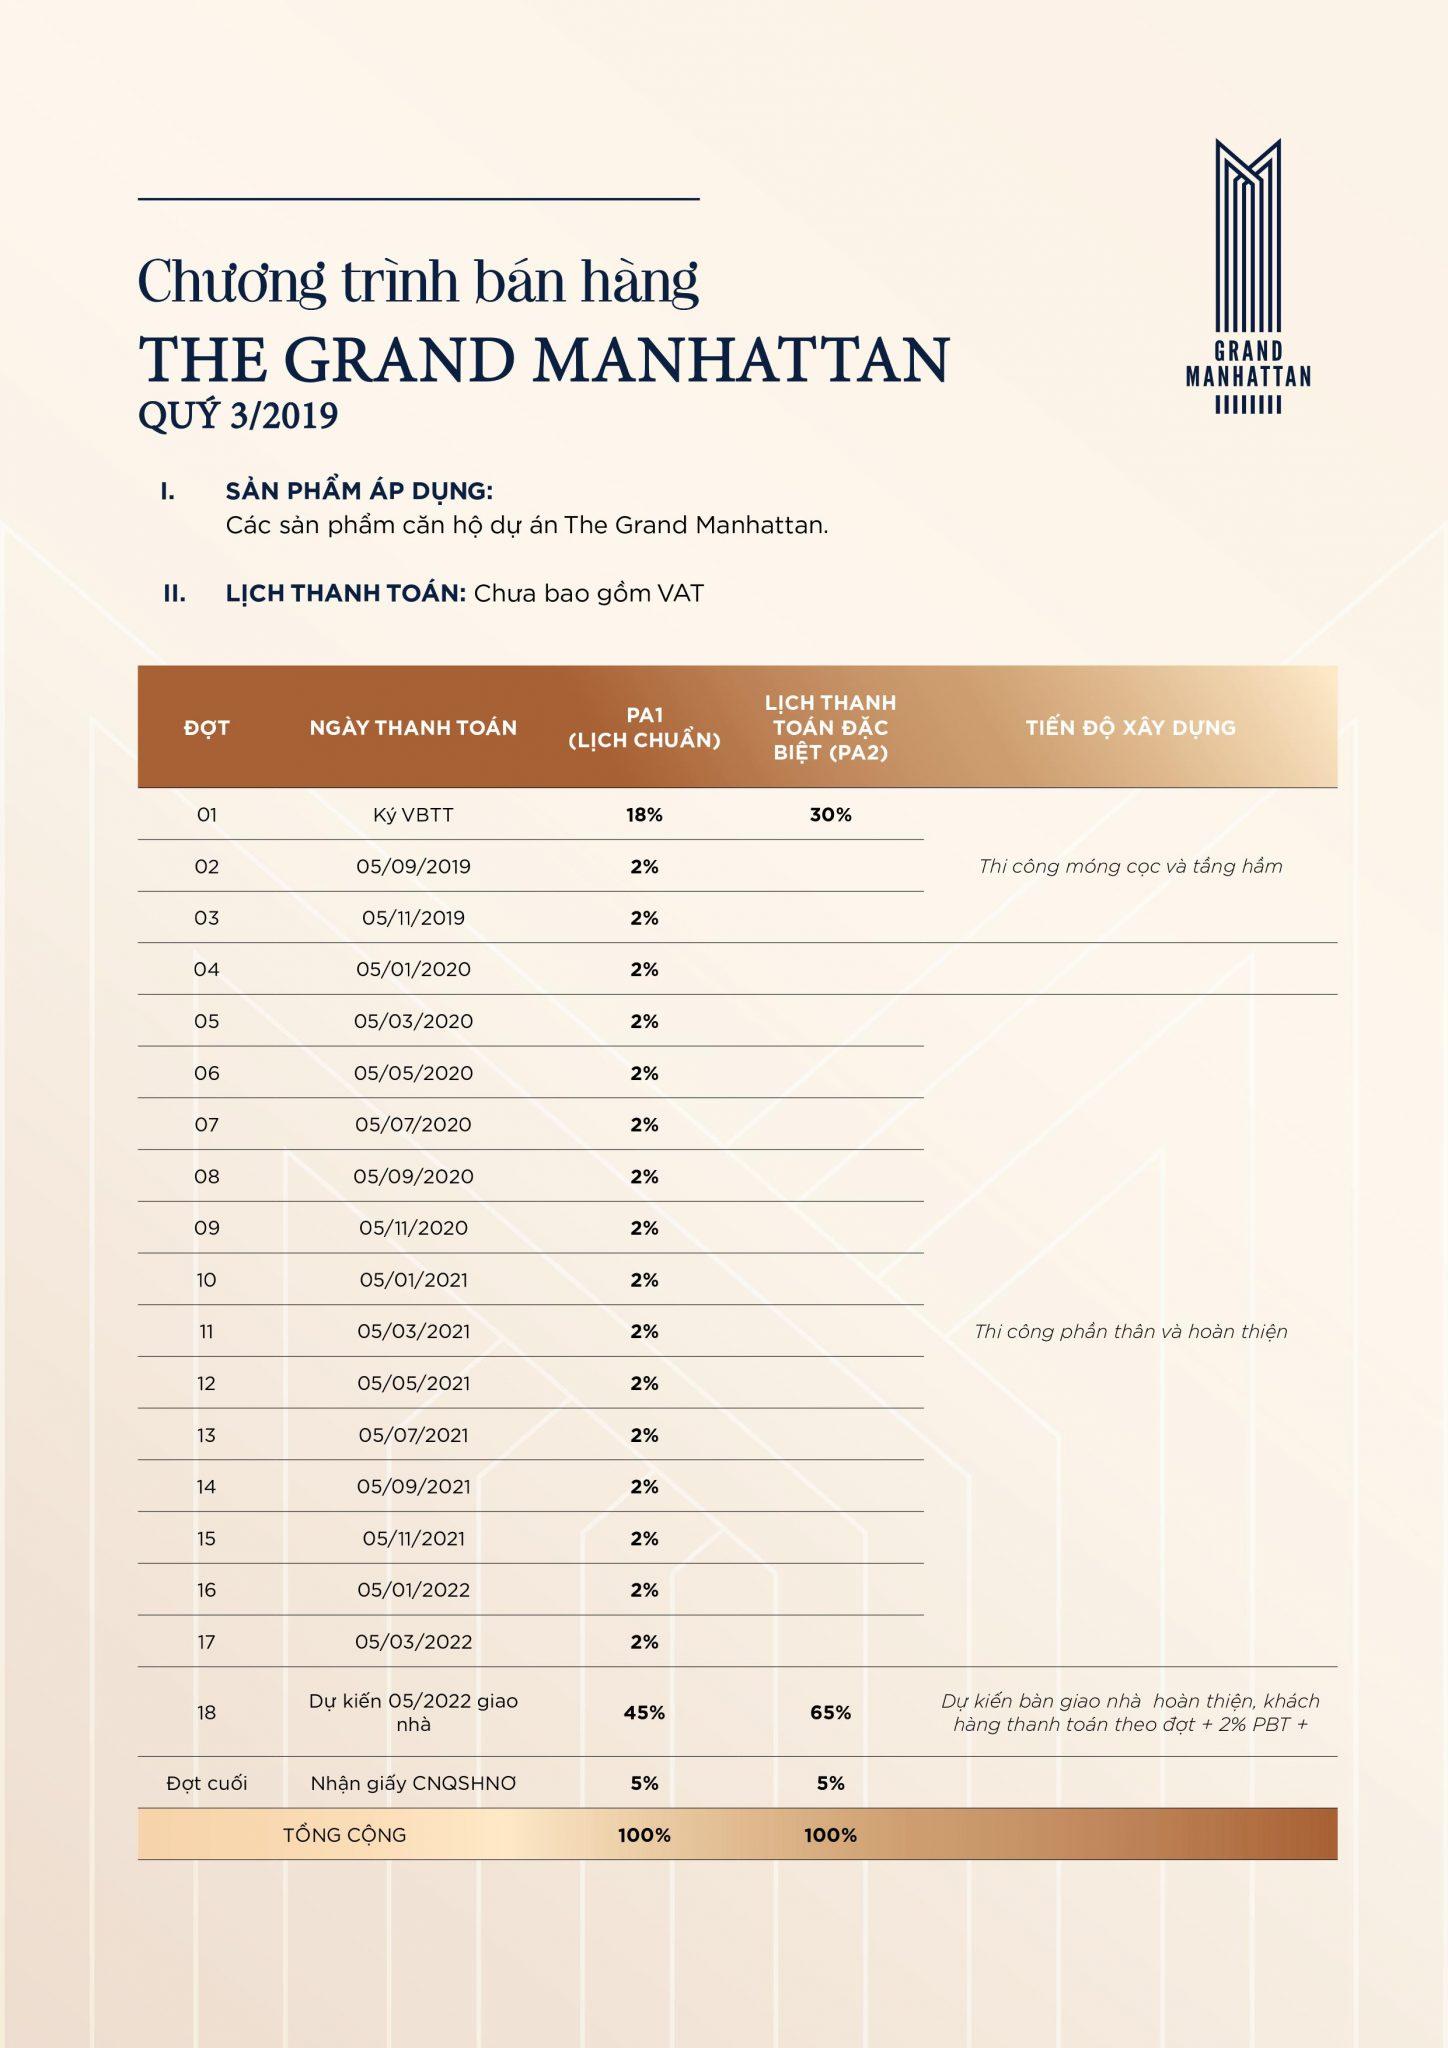 chinh-sach-ban-hang-tien-do-thanh-toan-grand-manhattan-1